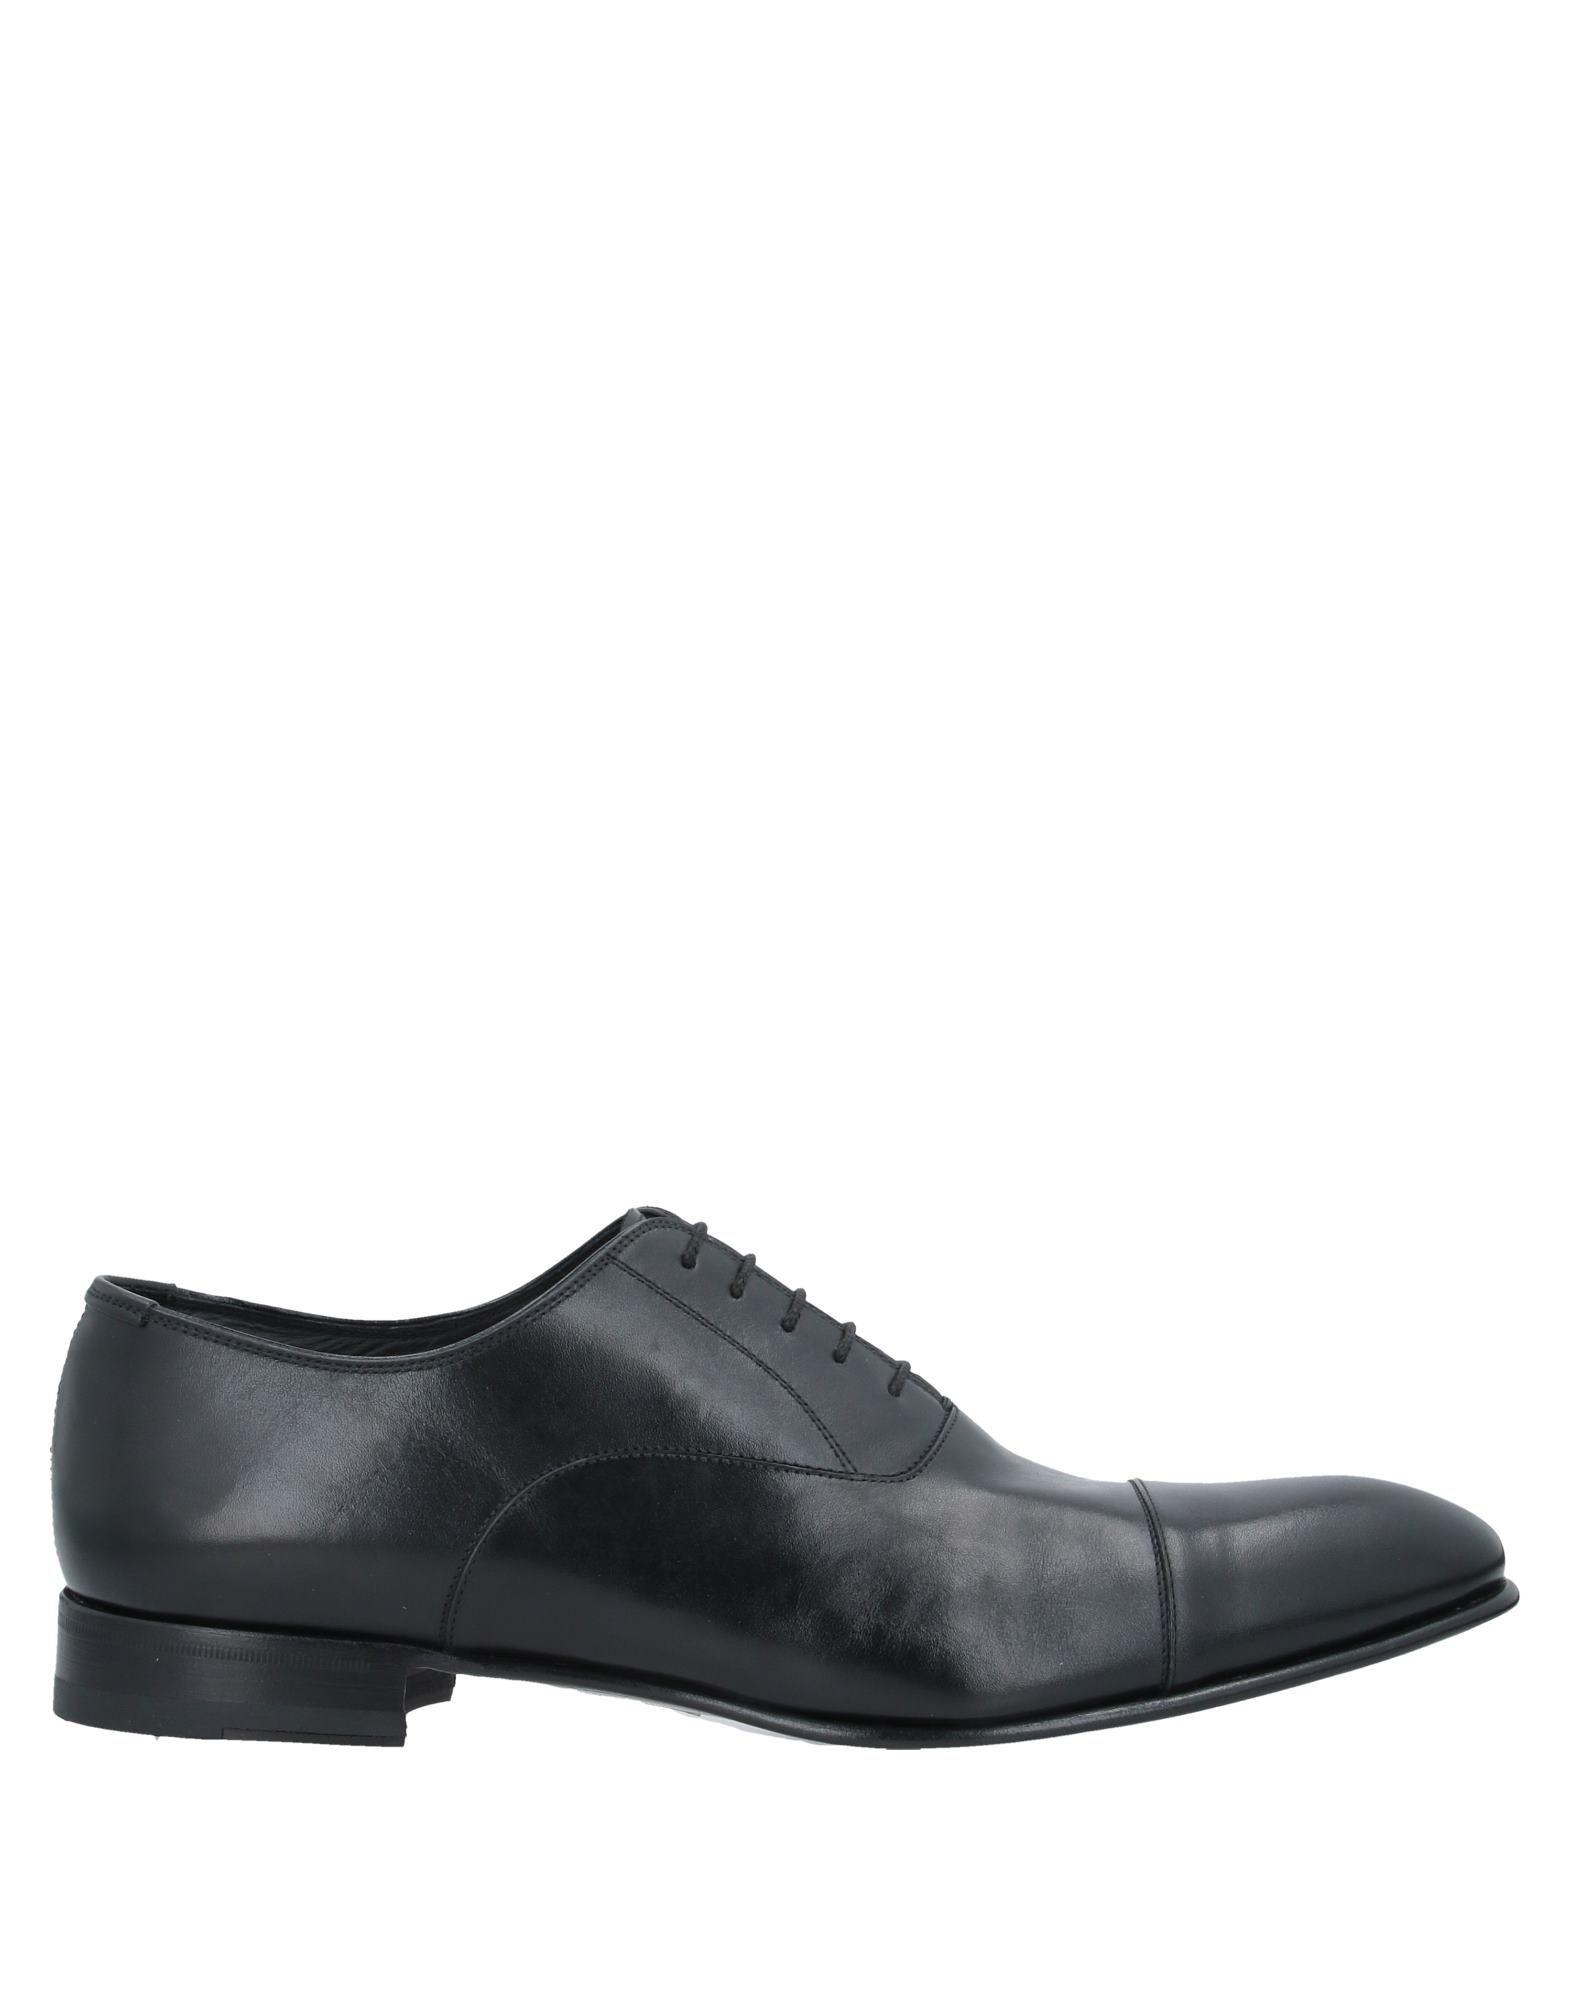 PHILIP JANSEN Обувь на шнурках